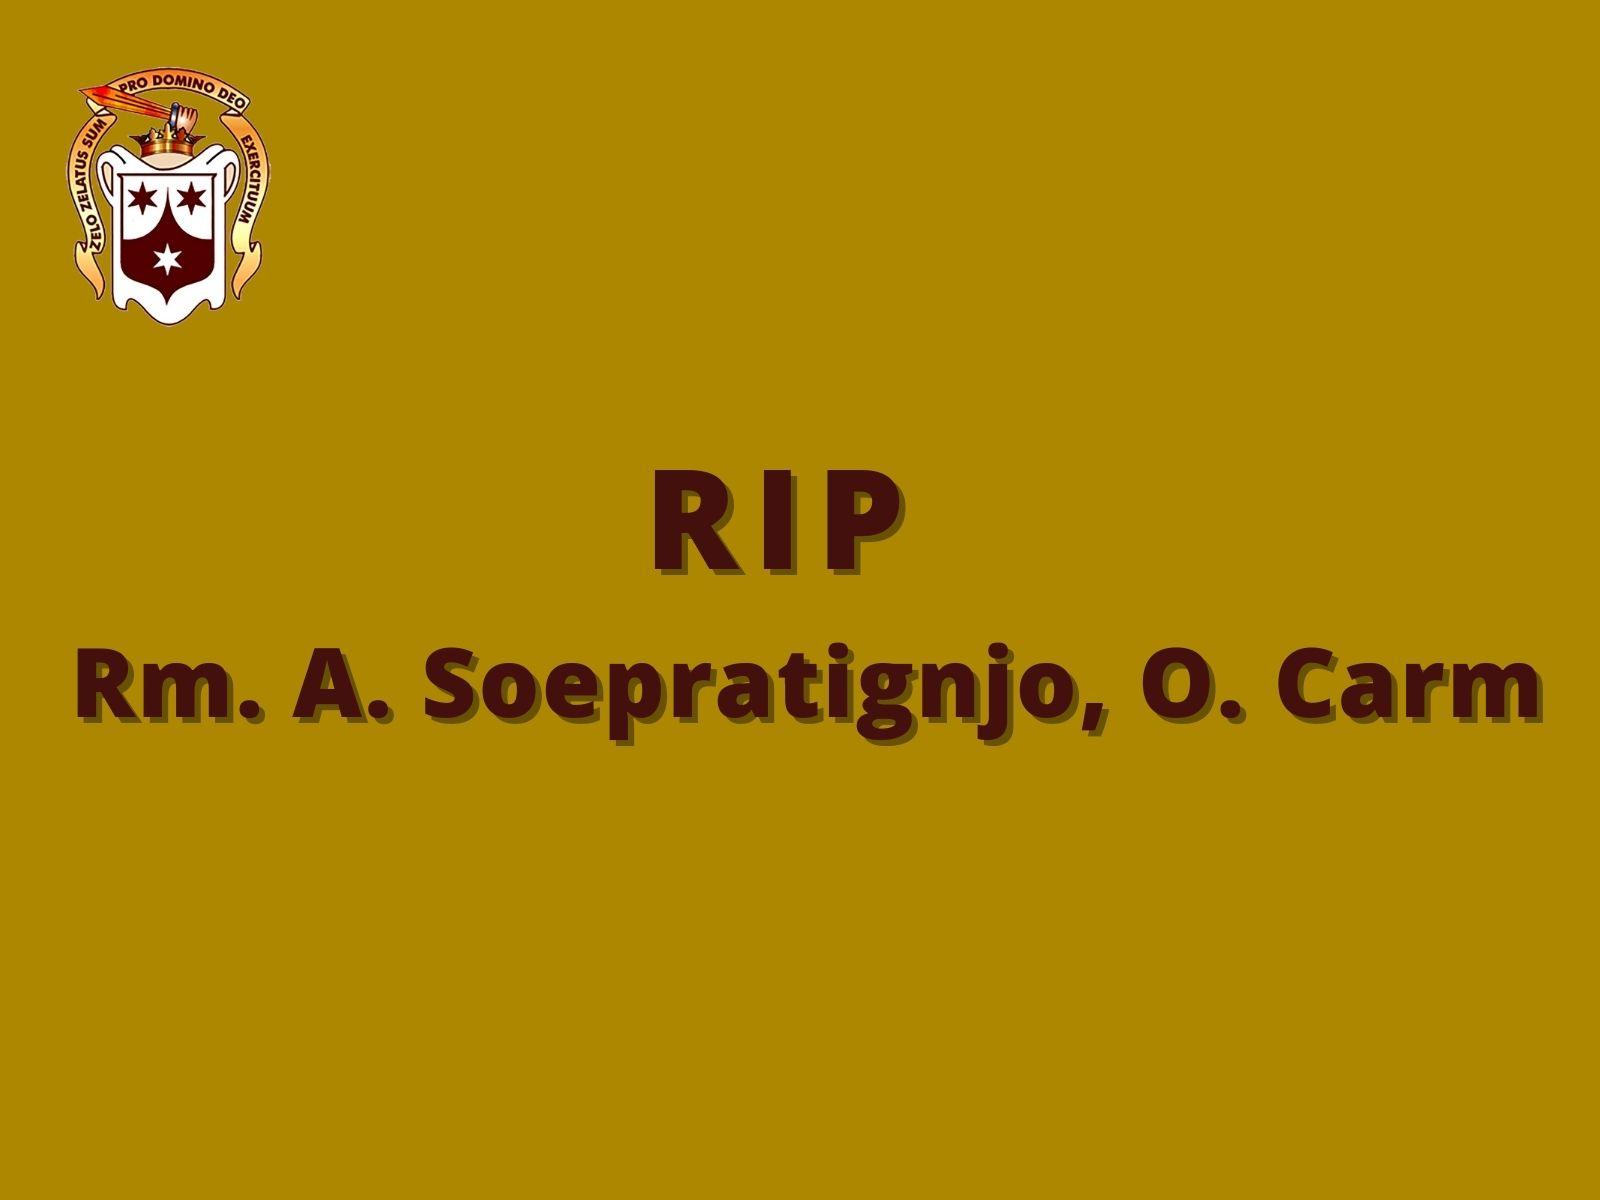 RIP: Rm. Angelus Soepratignjo, O. Carm.